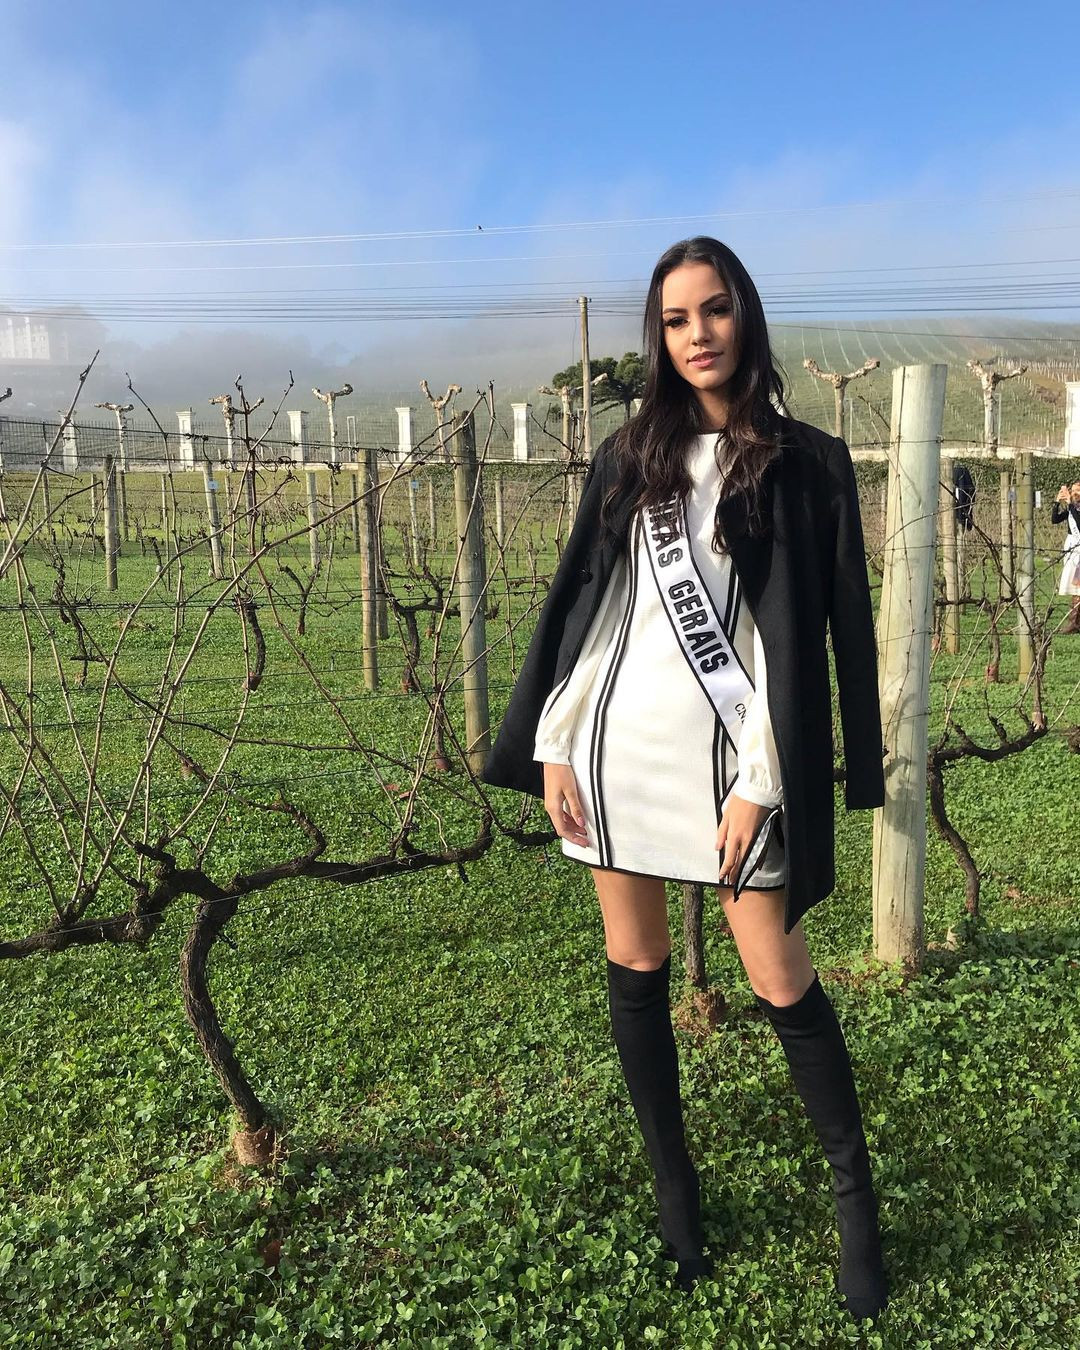 rafaella felipe, top 20 de miss brasil mundo 2019. - Página 2 Qlbjsf10